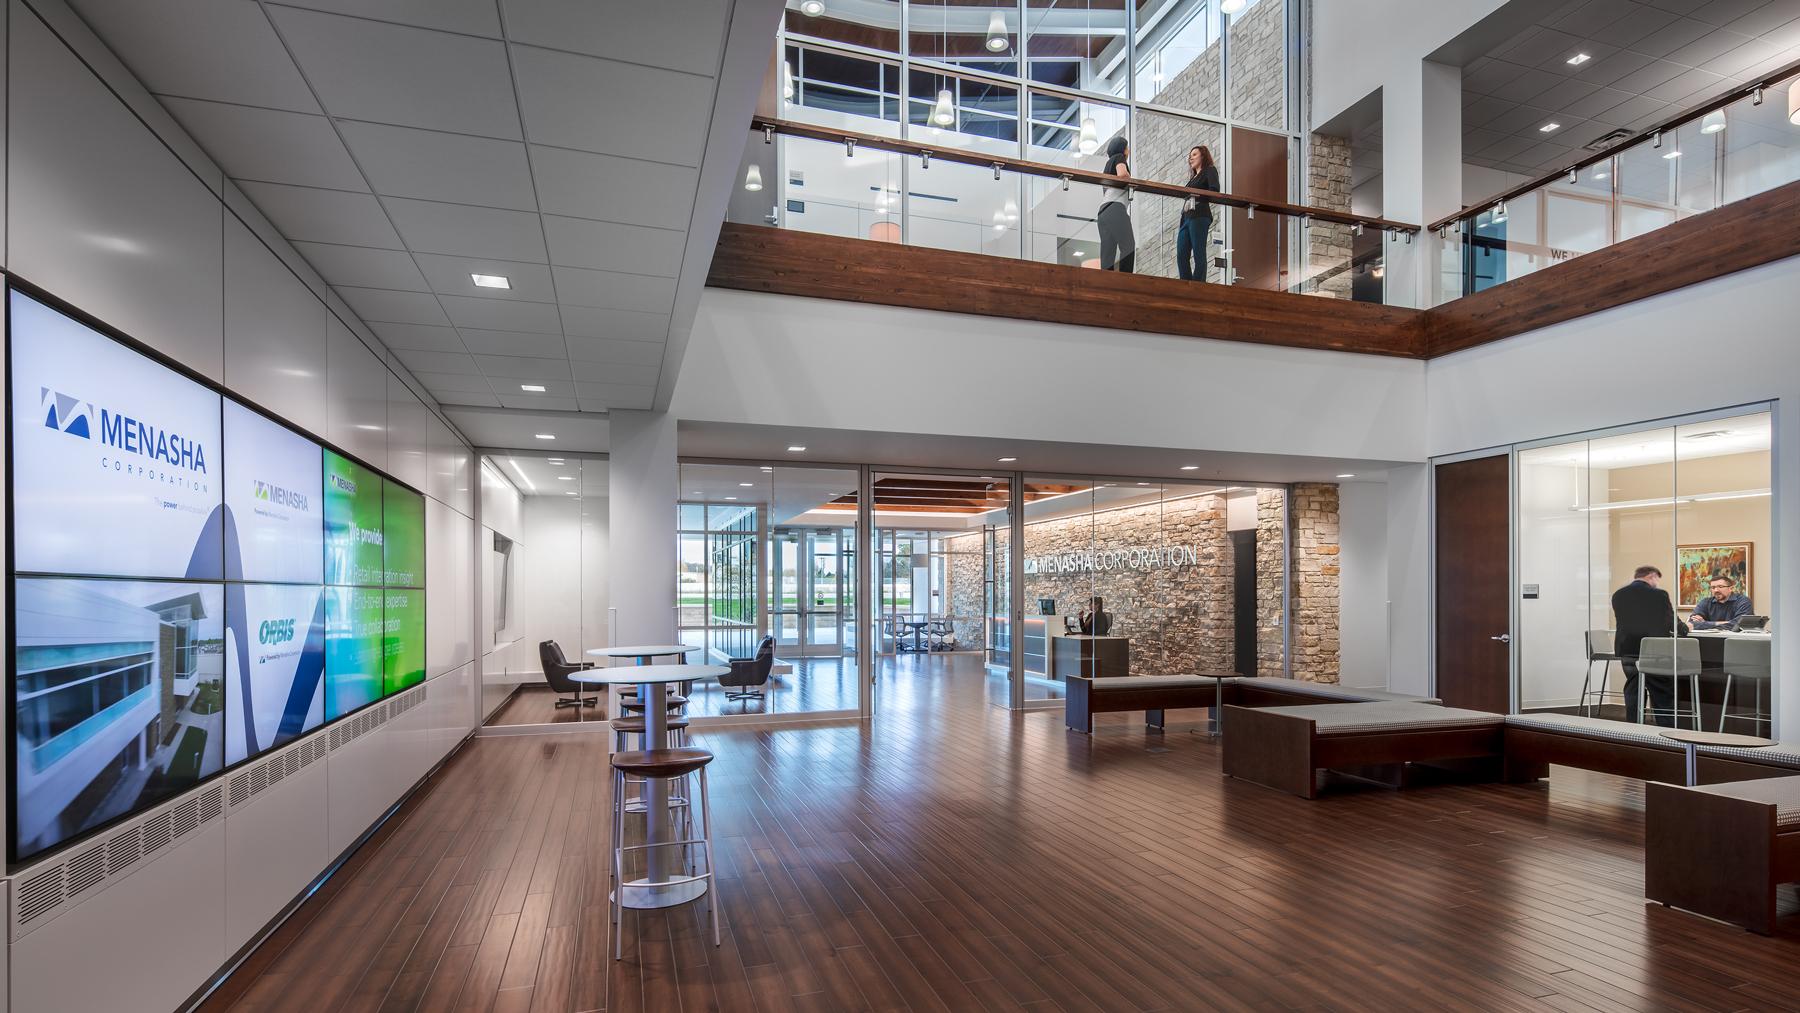 Henricksen_PROJ_Menasha-Corp_entrance-atrium